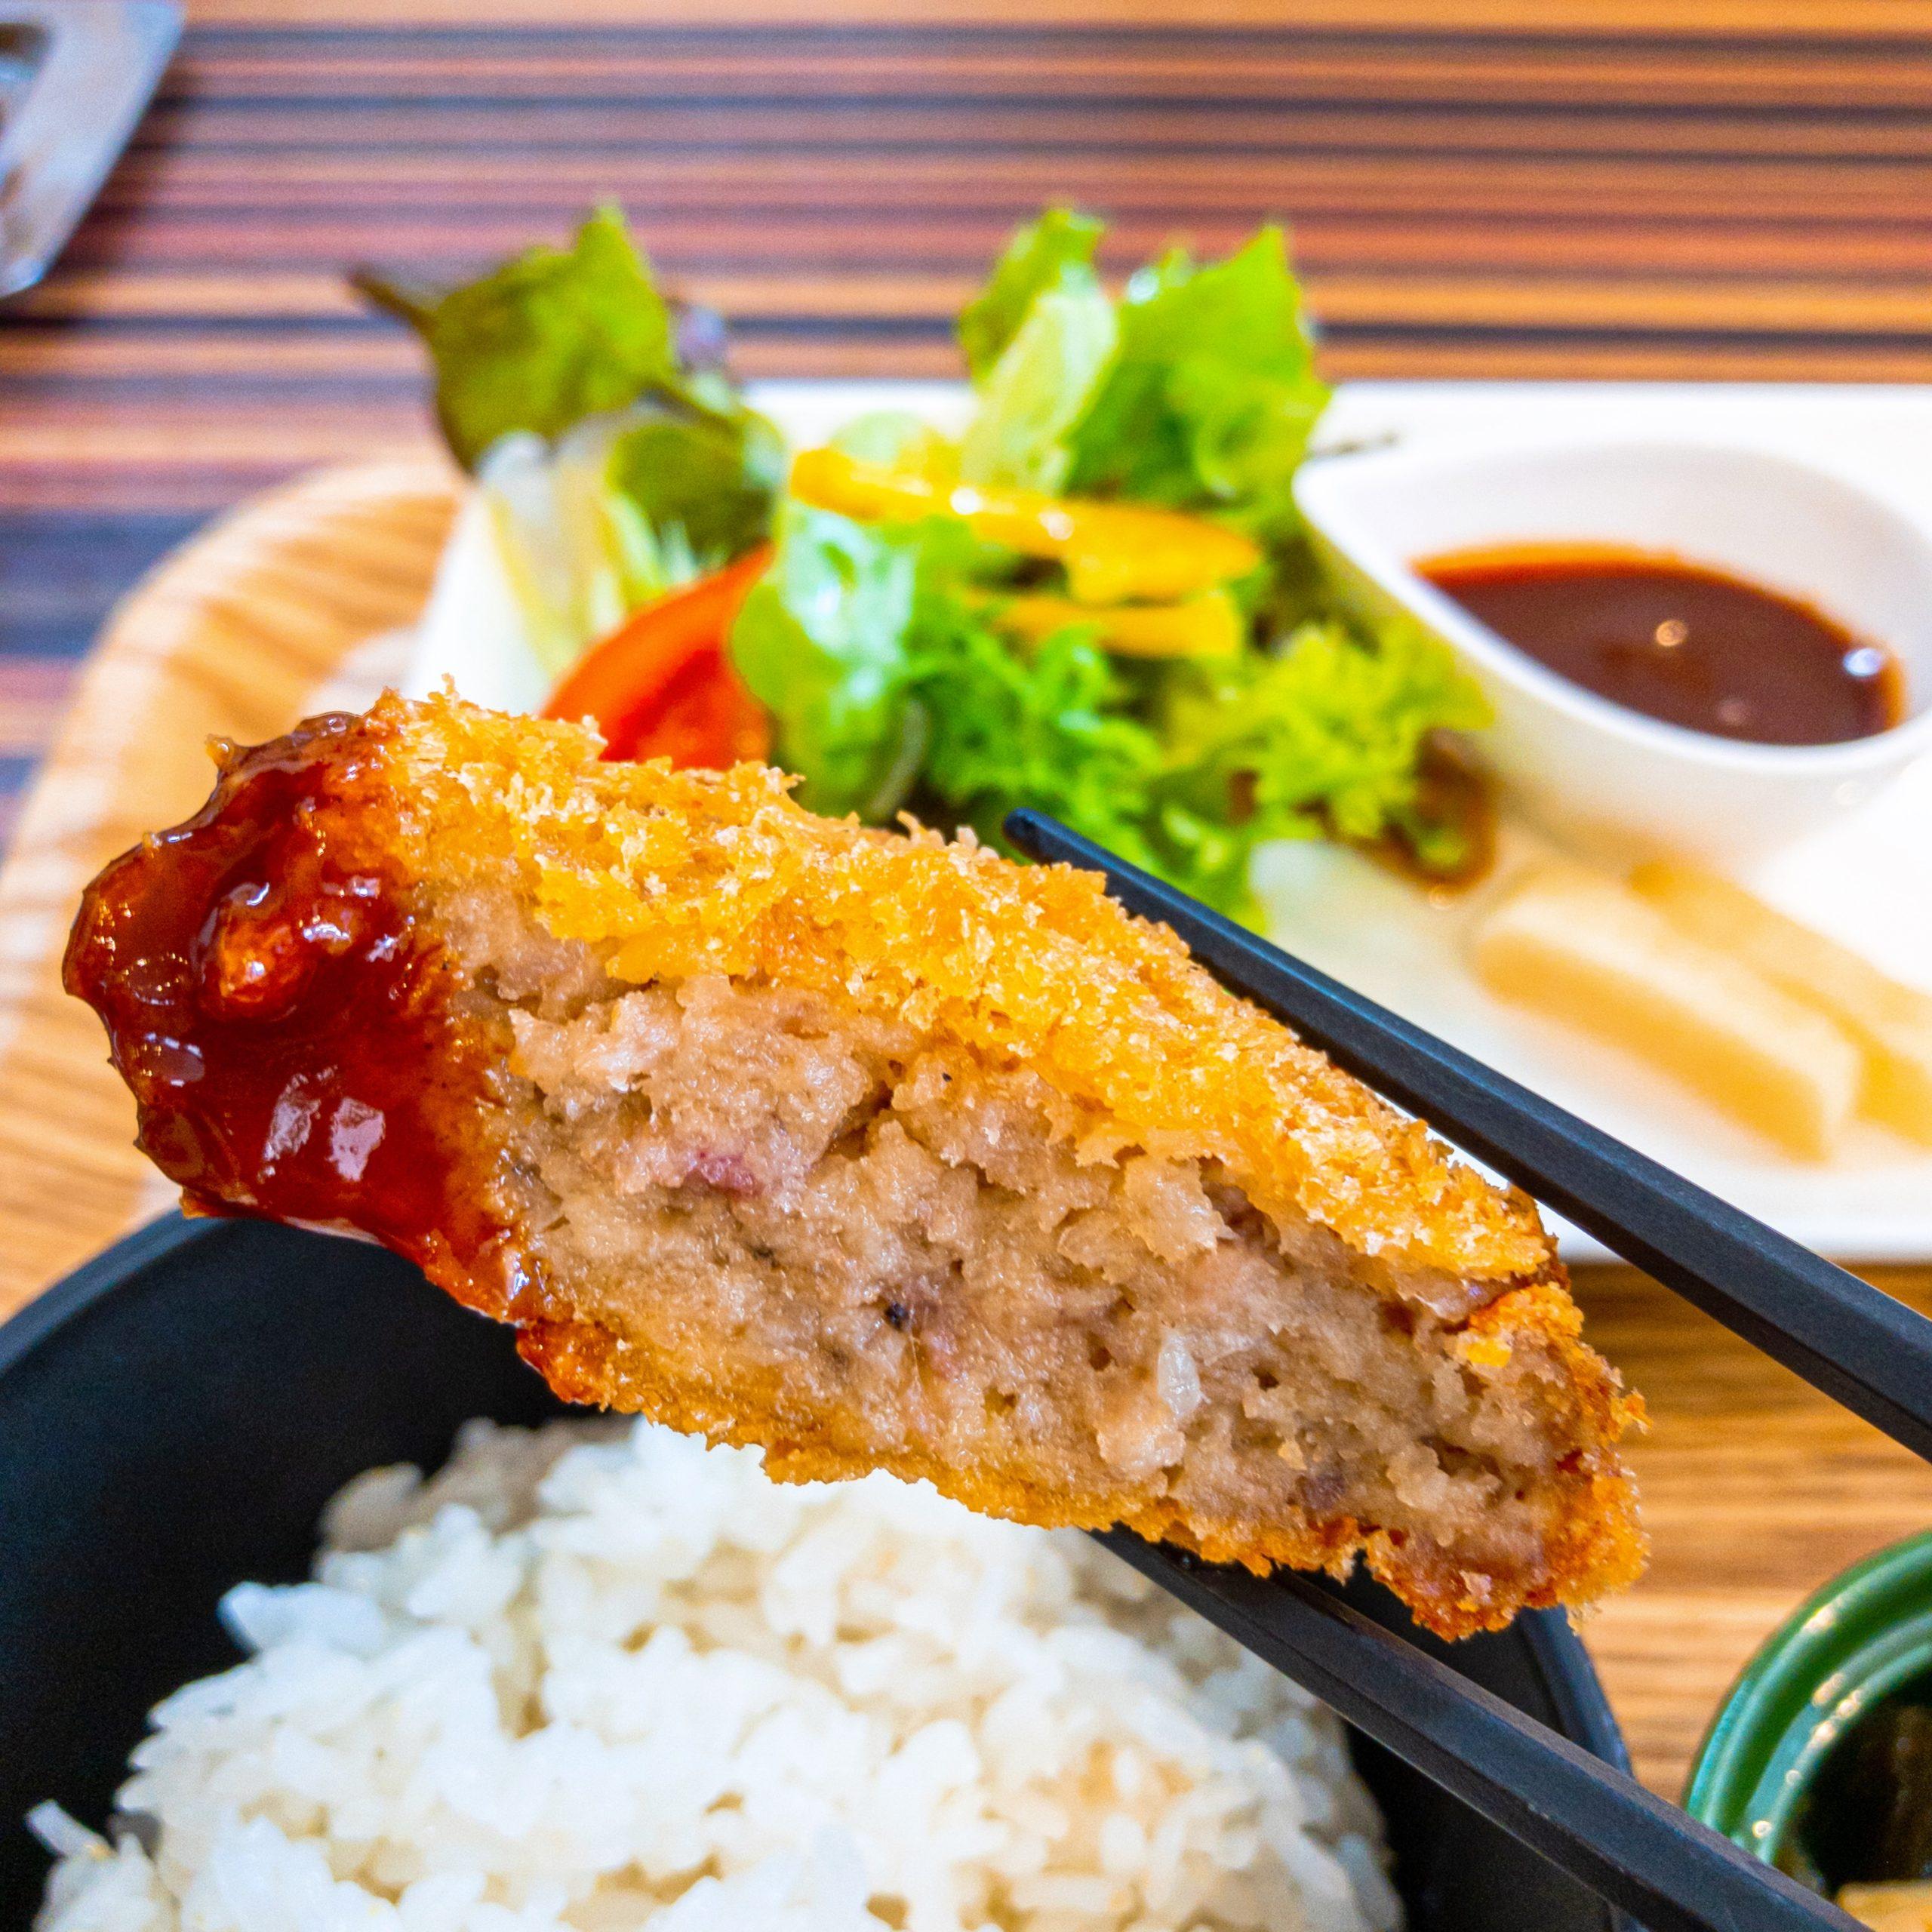 YAKINIKU & STEAK GIN の「お店自慢のお惣菜ランチ」のメンチカツのアップ